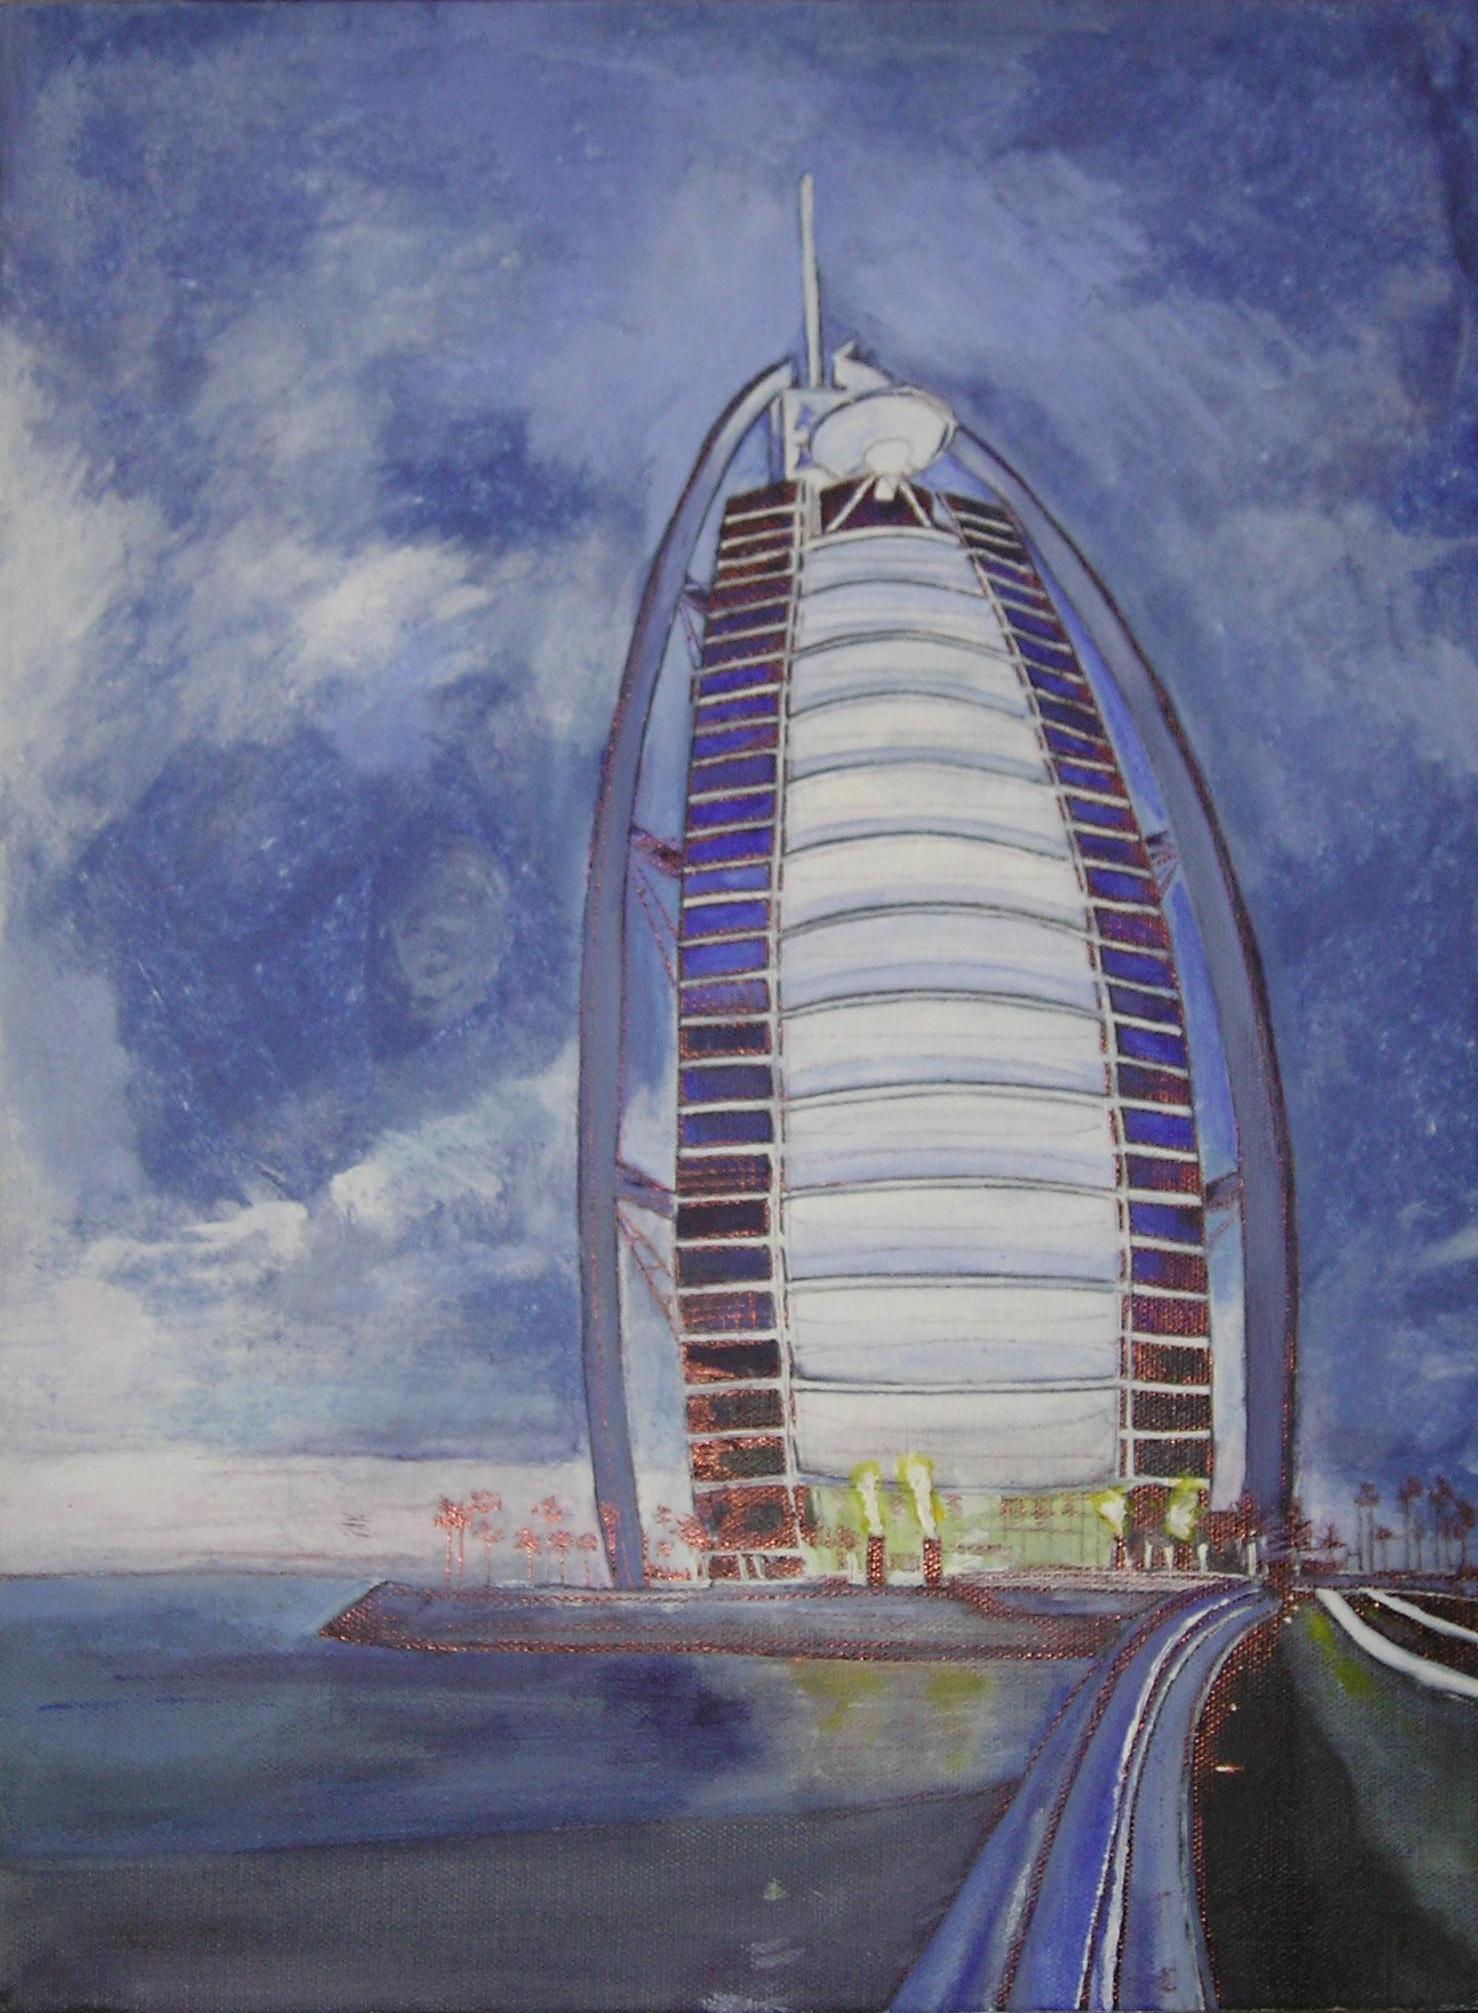 Burj Al Arab By Clairec666 On Deviantart